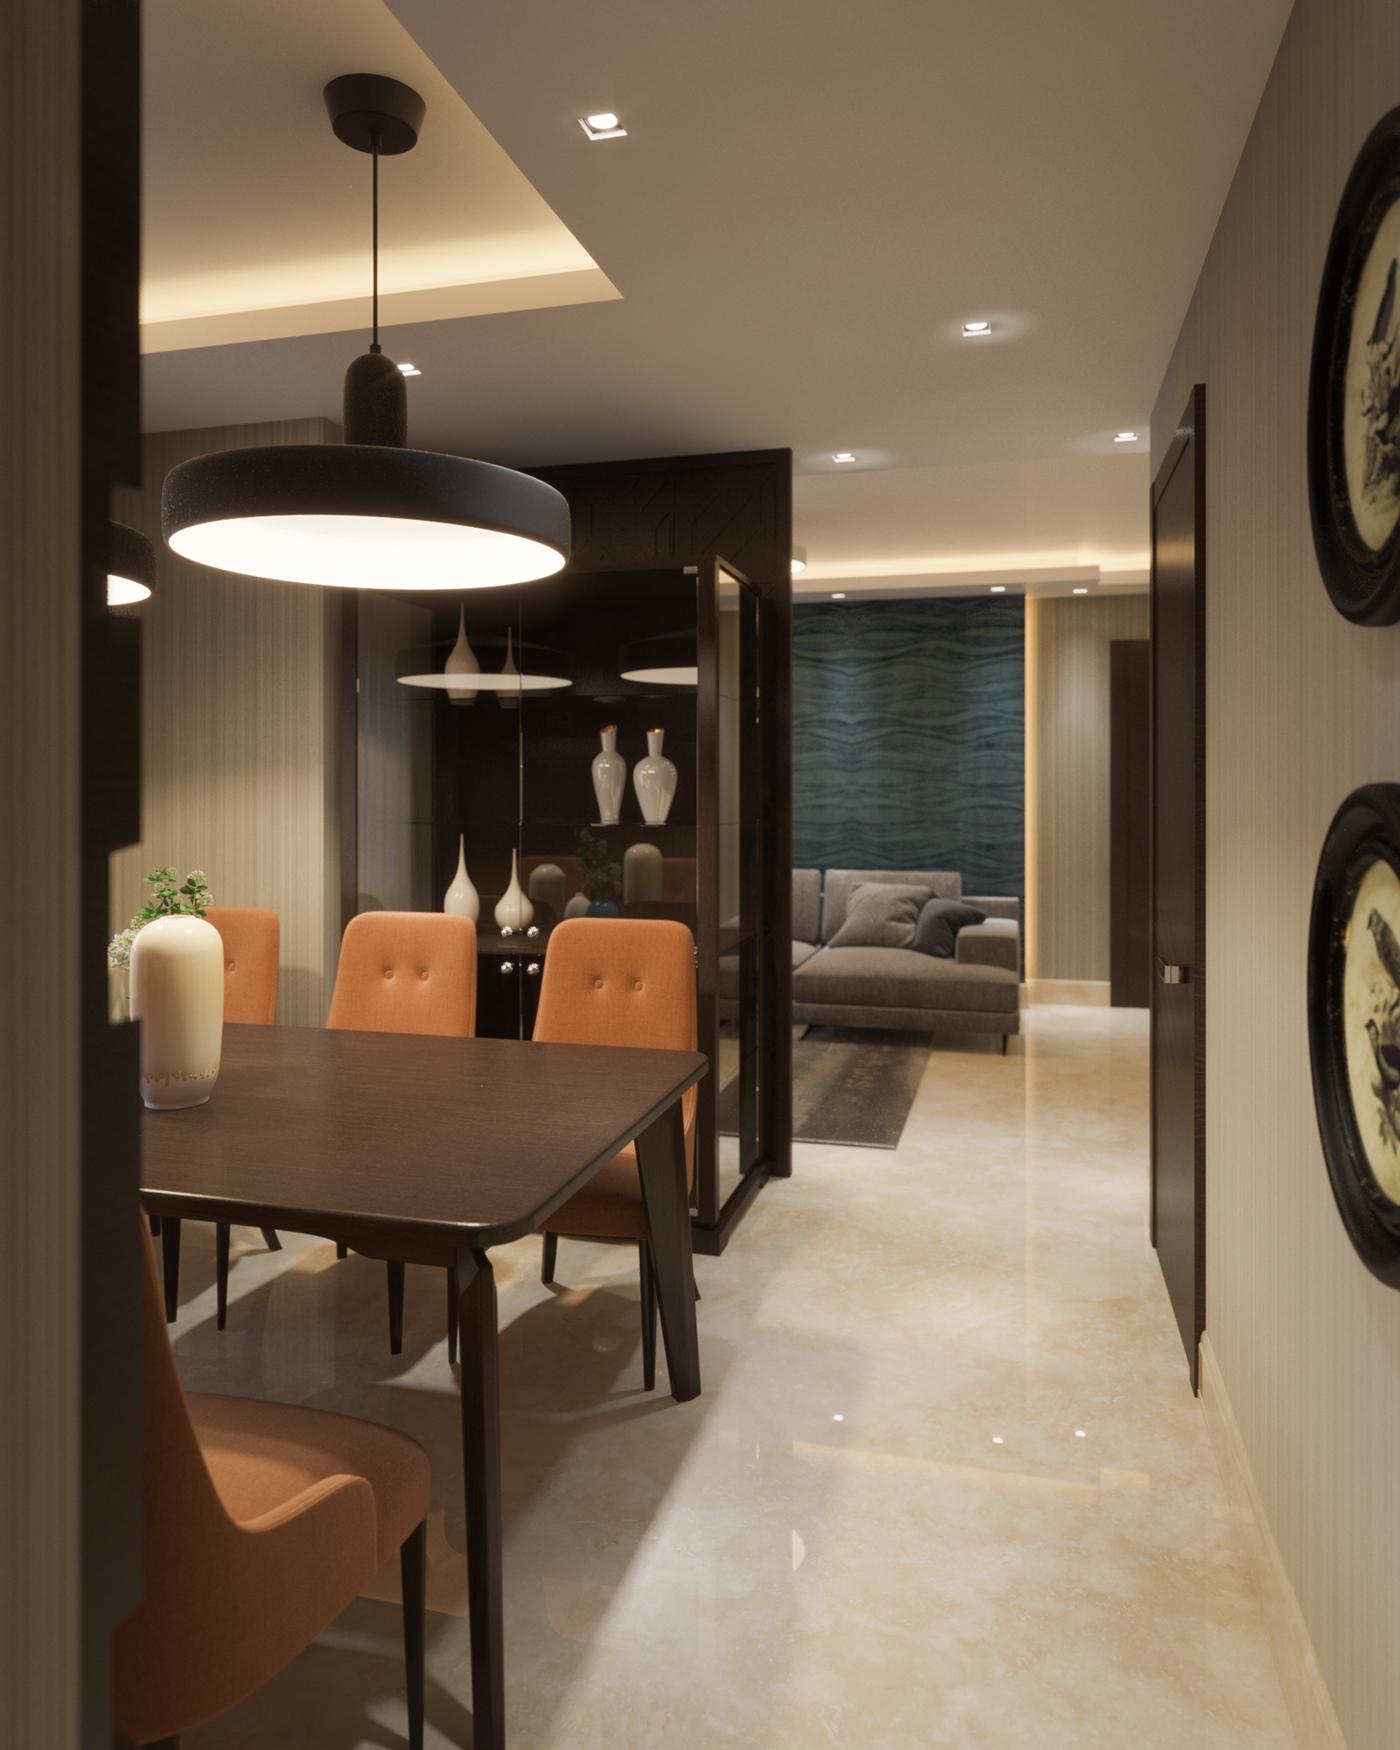 apartment,bedroom,living,bathroom,toilet,reception